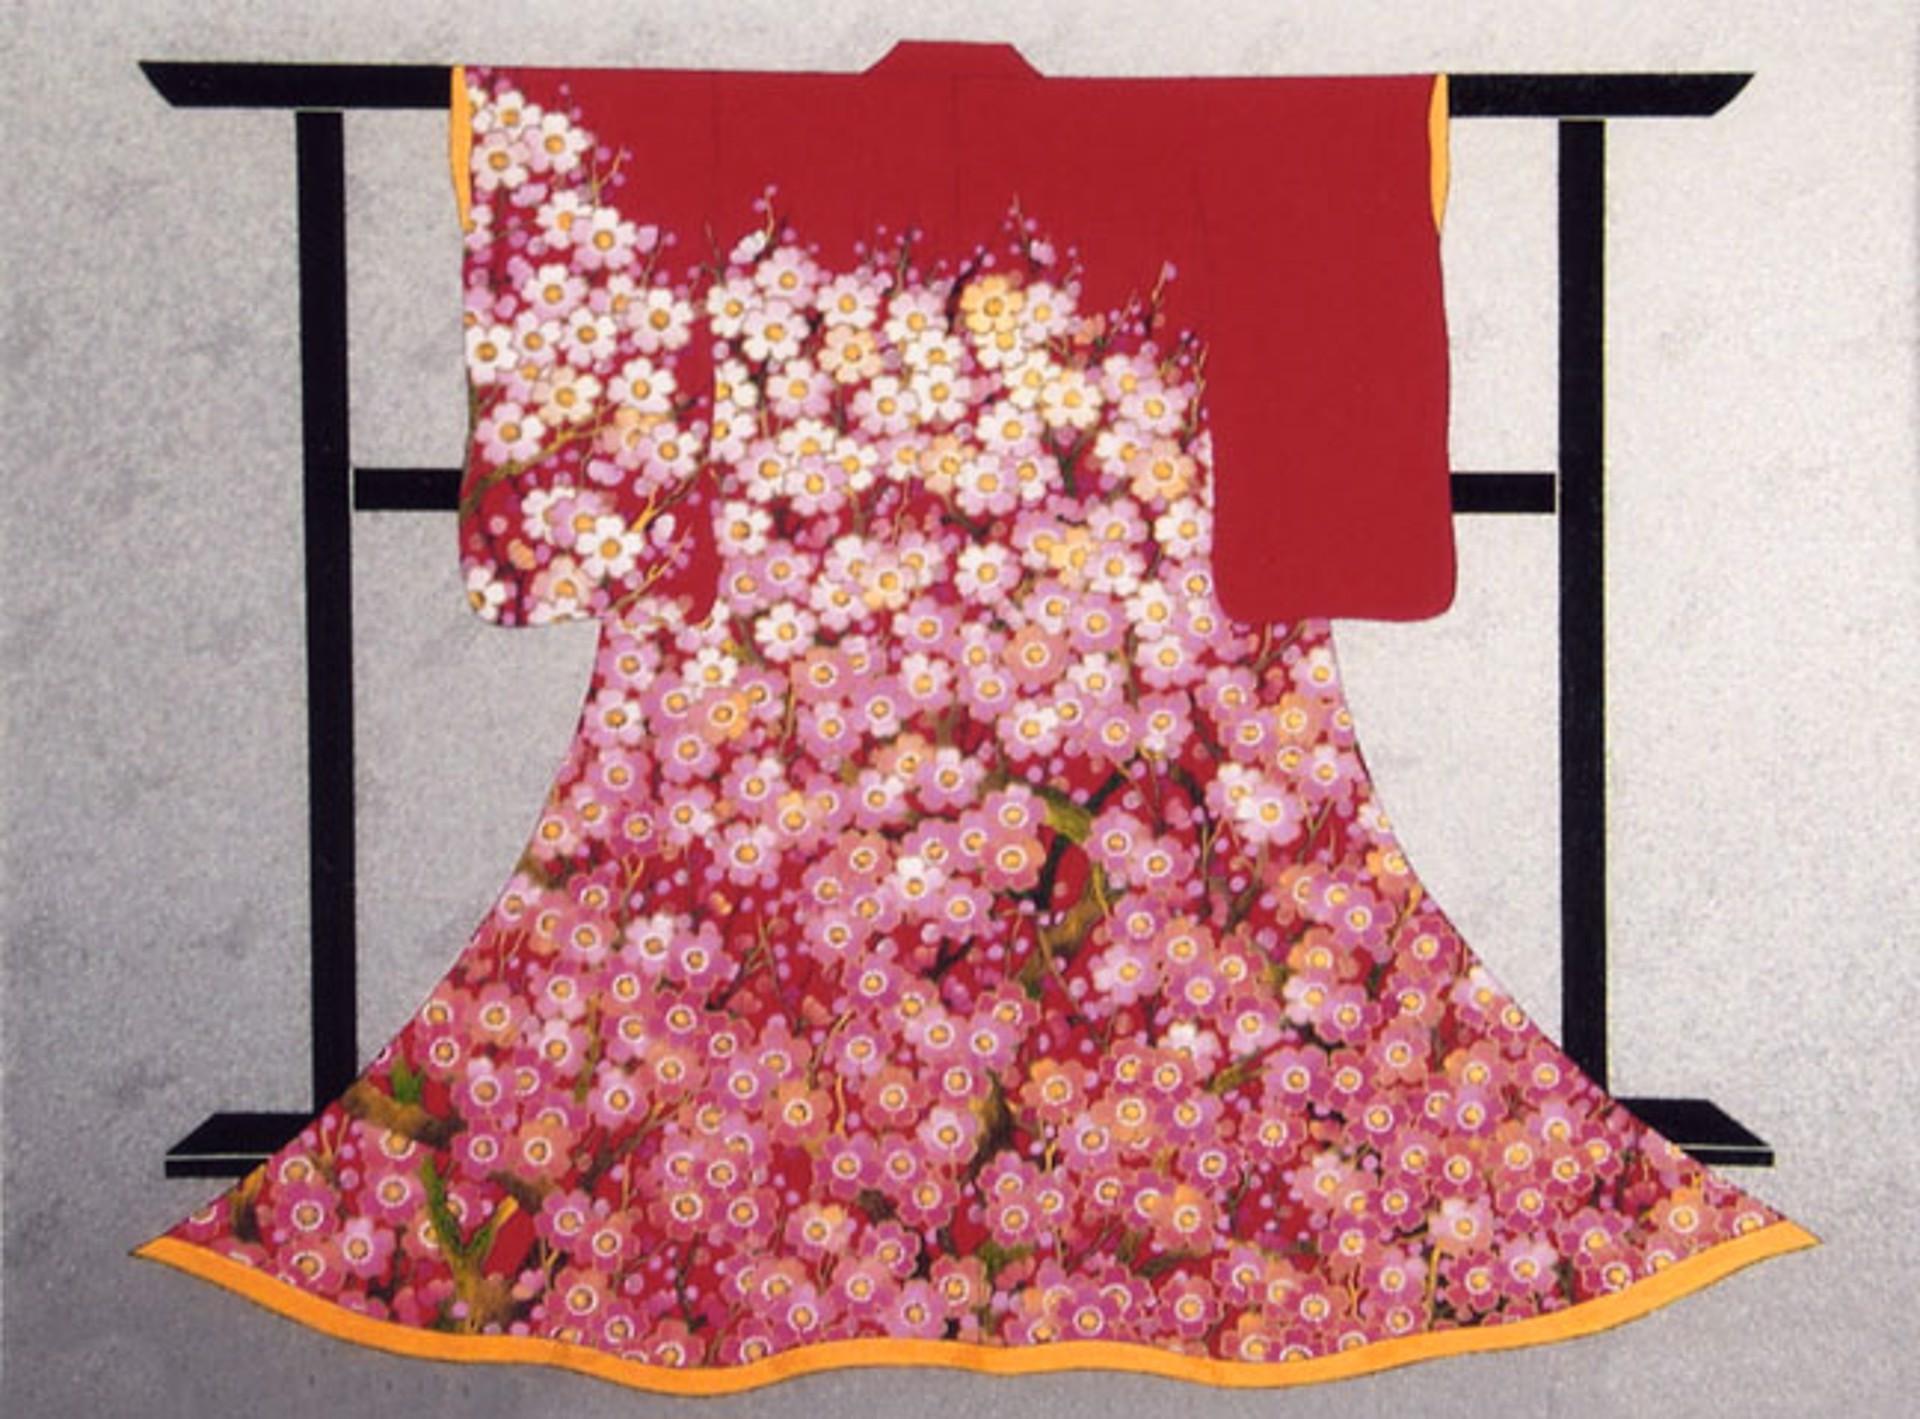 Kanreki #Ix by Hisashi Otsuka